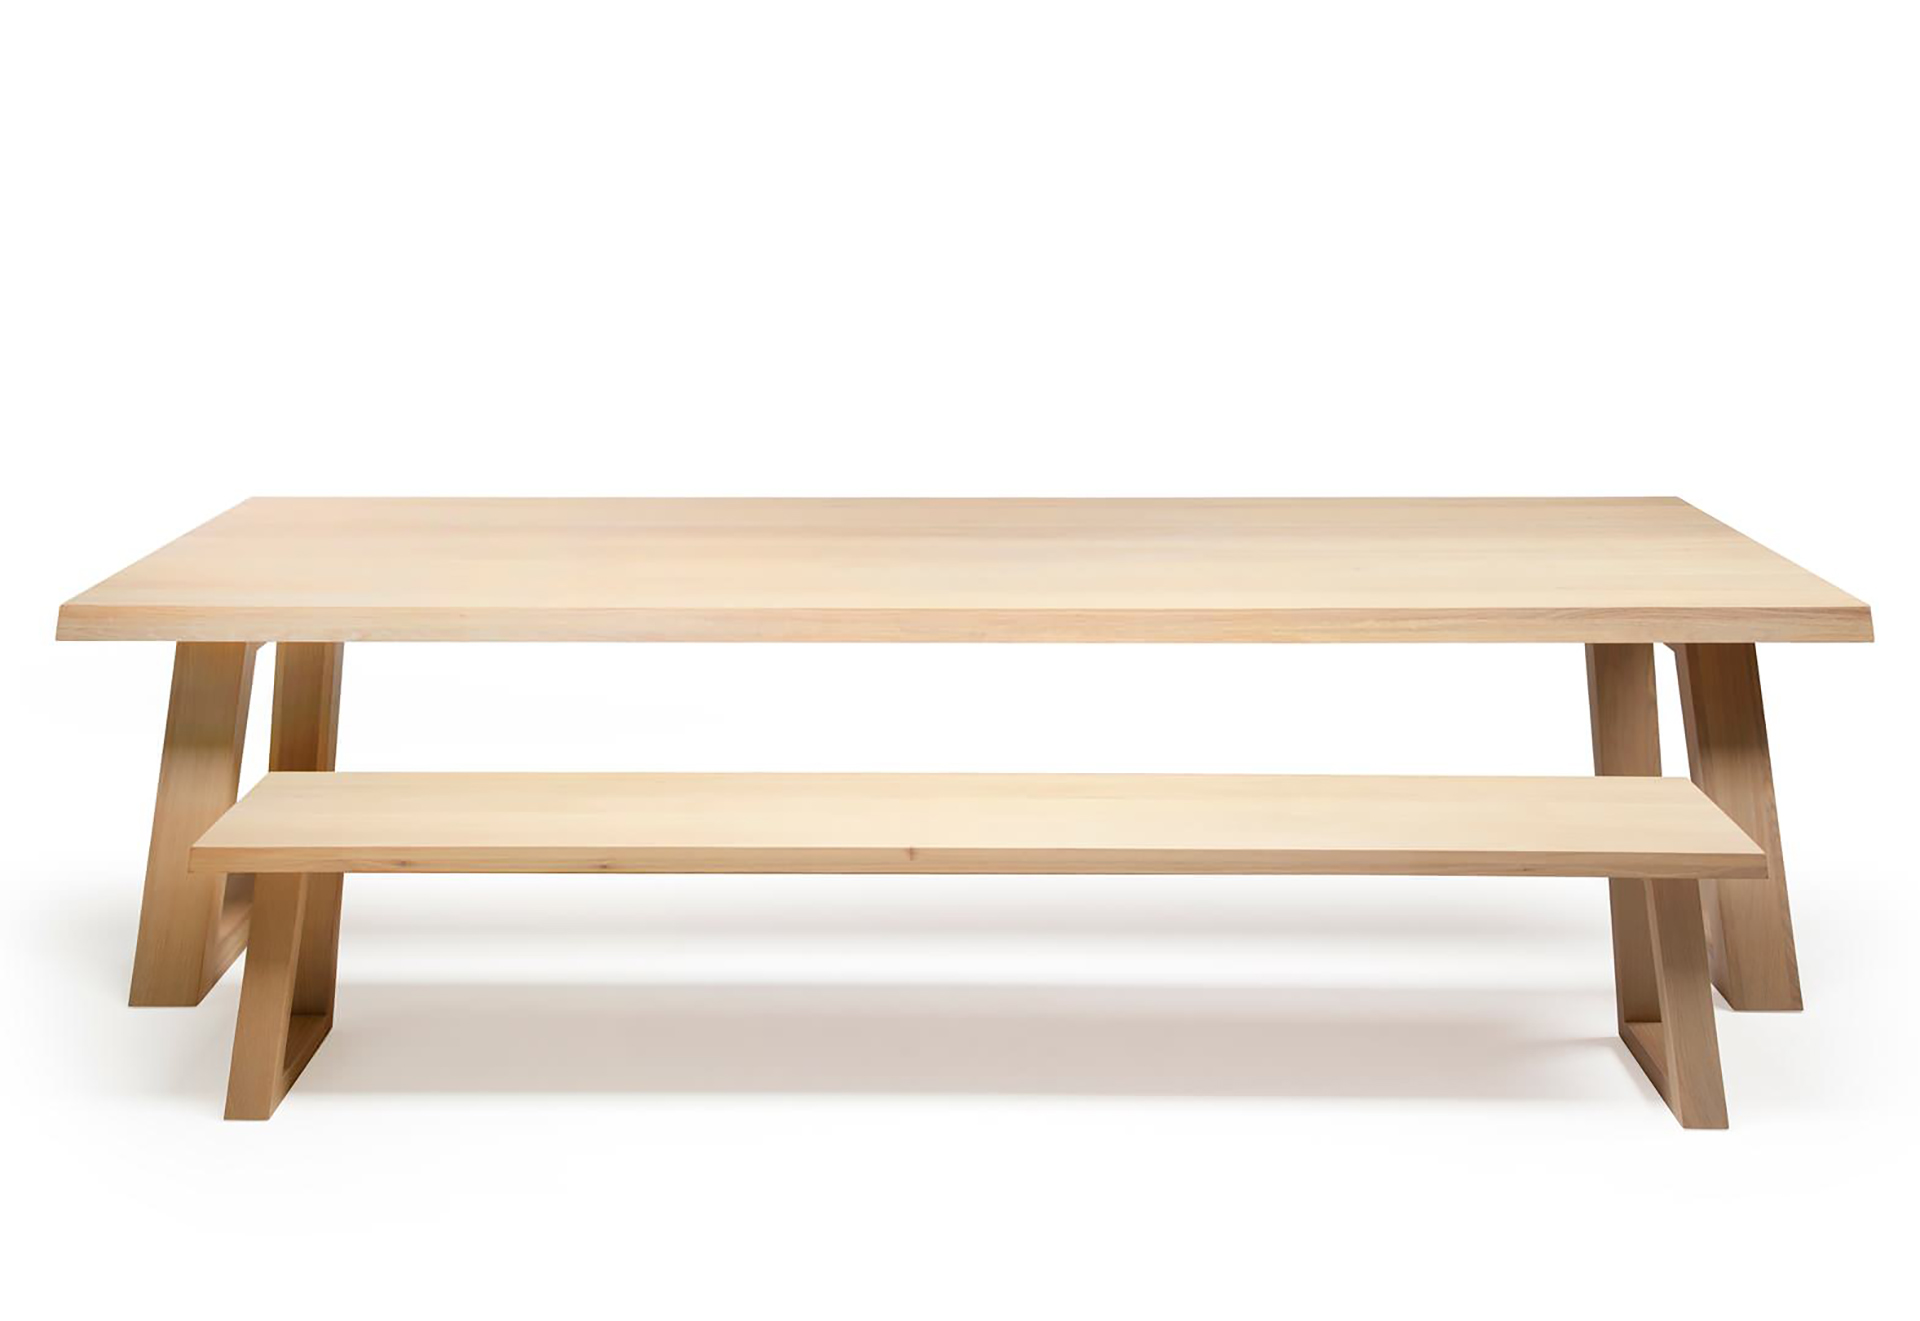 Bankje Wit Hout.Design Bench Slide L Remy Meijers L Odesi Your Dutch Design